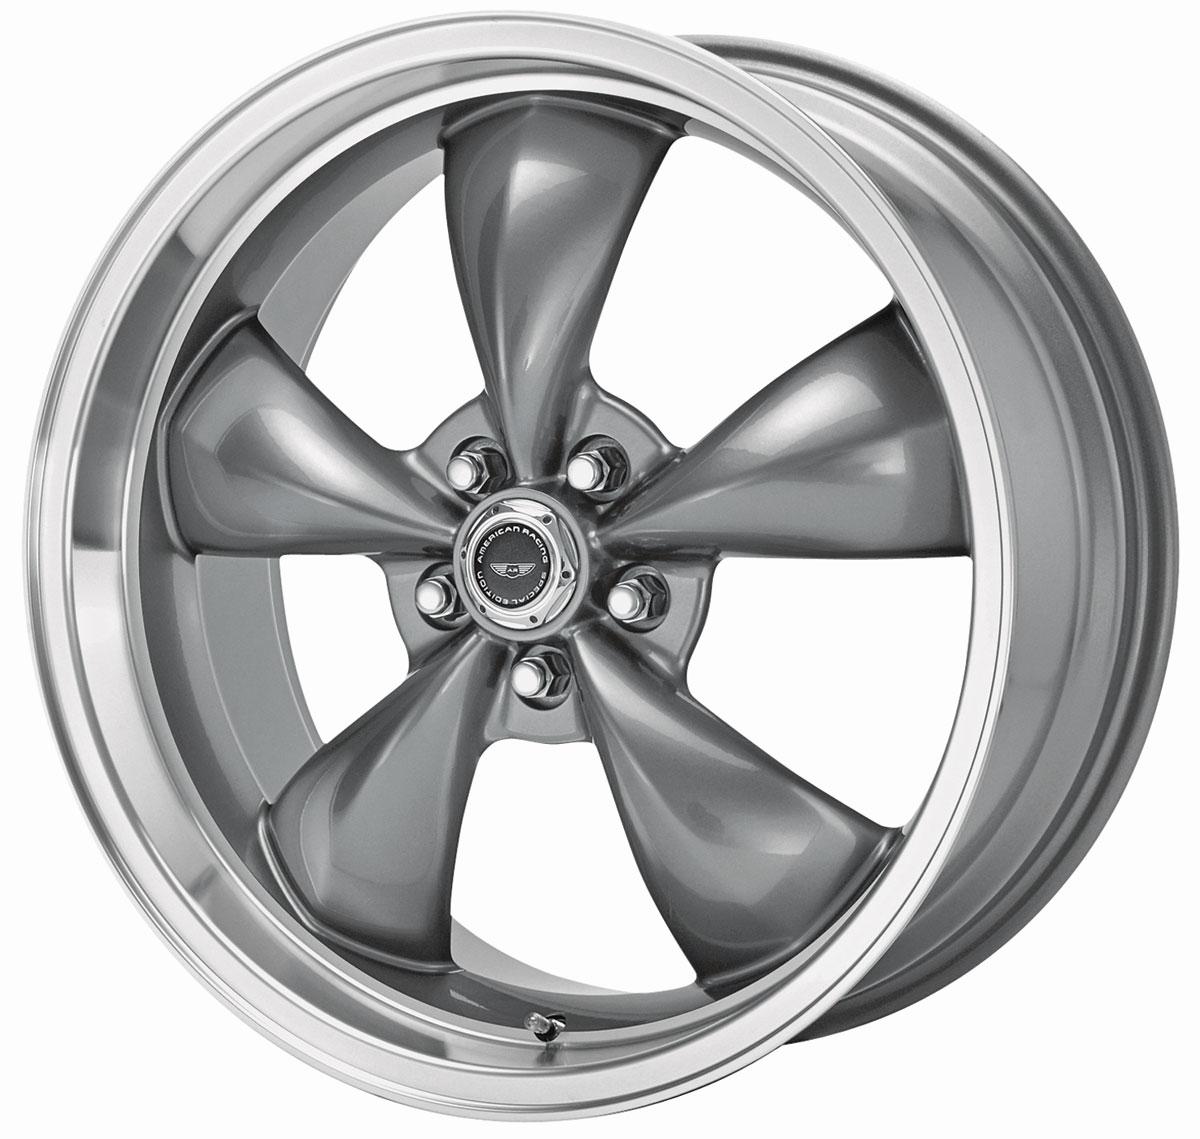 Wheel, American Racing, AR105 Torq Thrust M, 2003-2019 CAD, 17x7.5